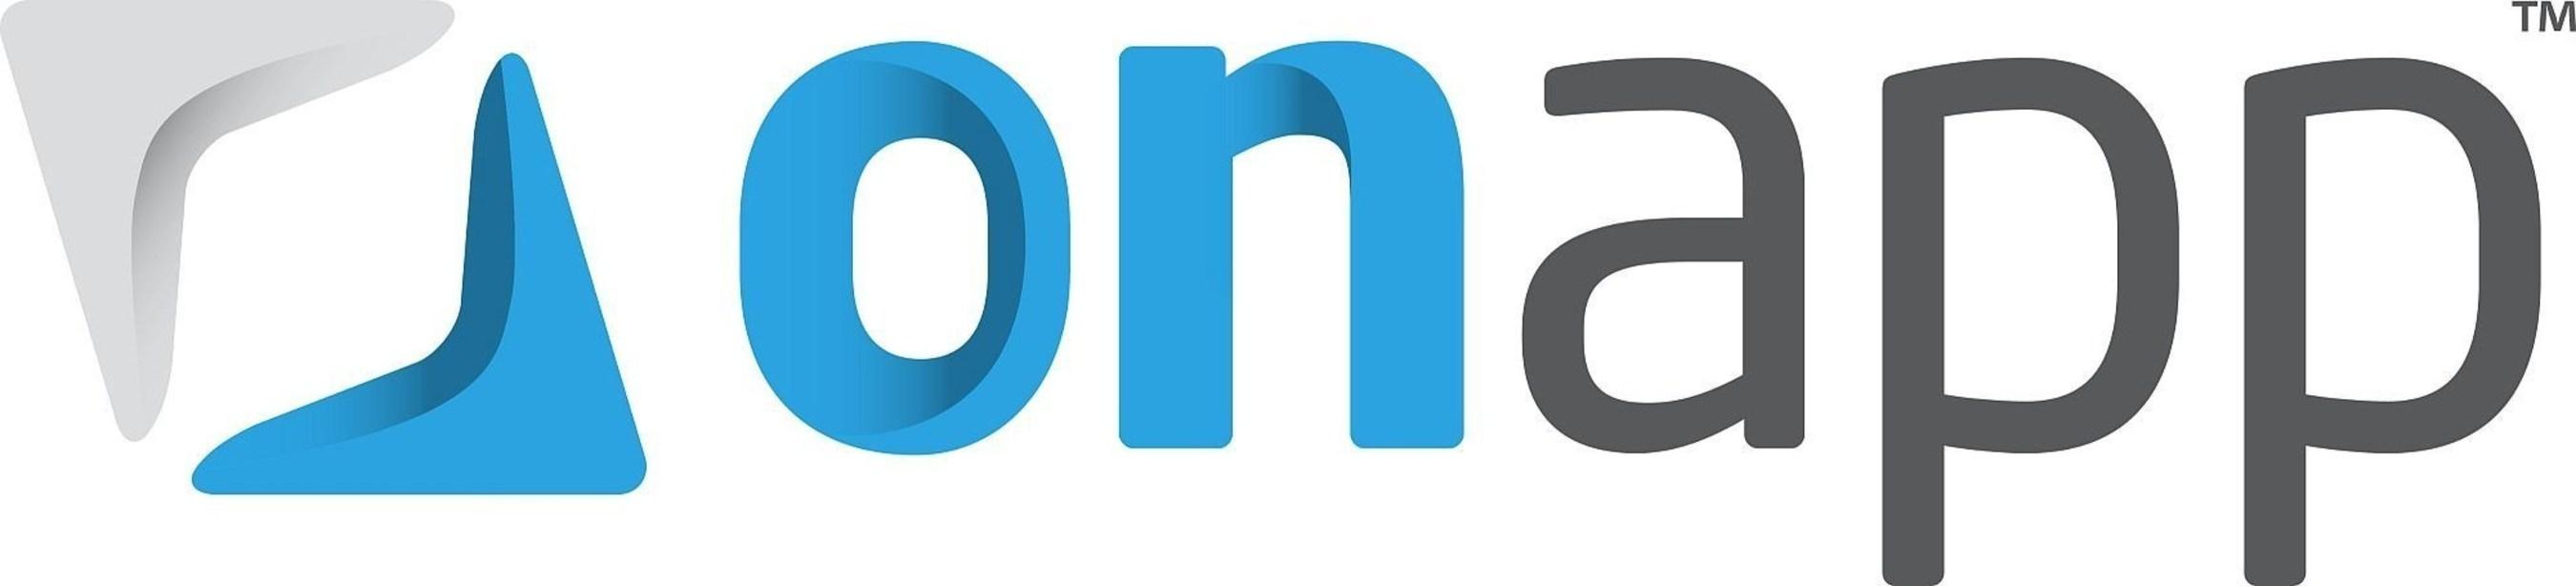 OnApp (PRNewsFoto/OnApp) (PRNewsFoto/OnApp)